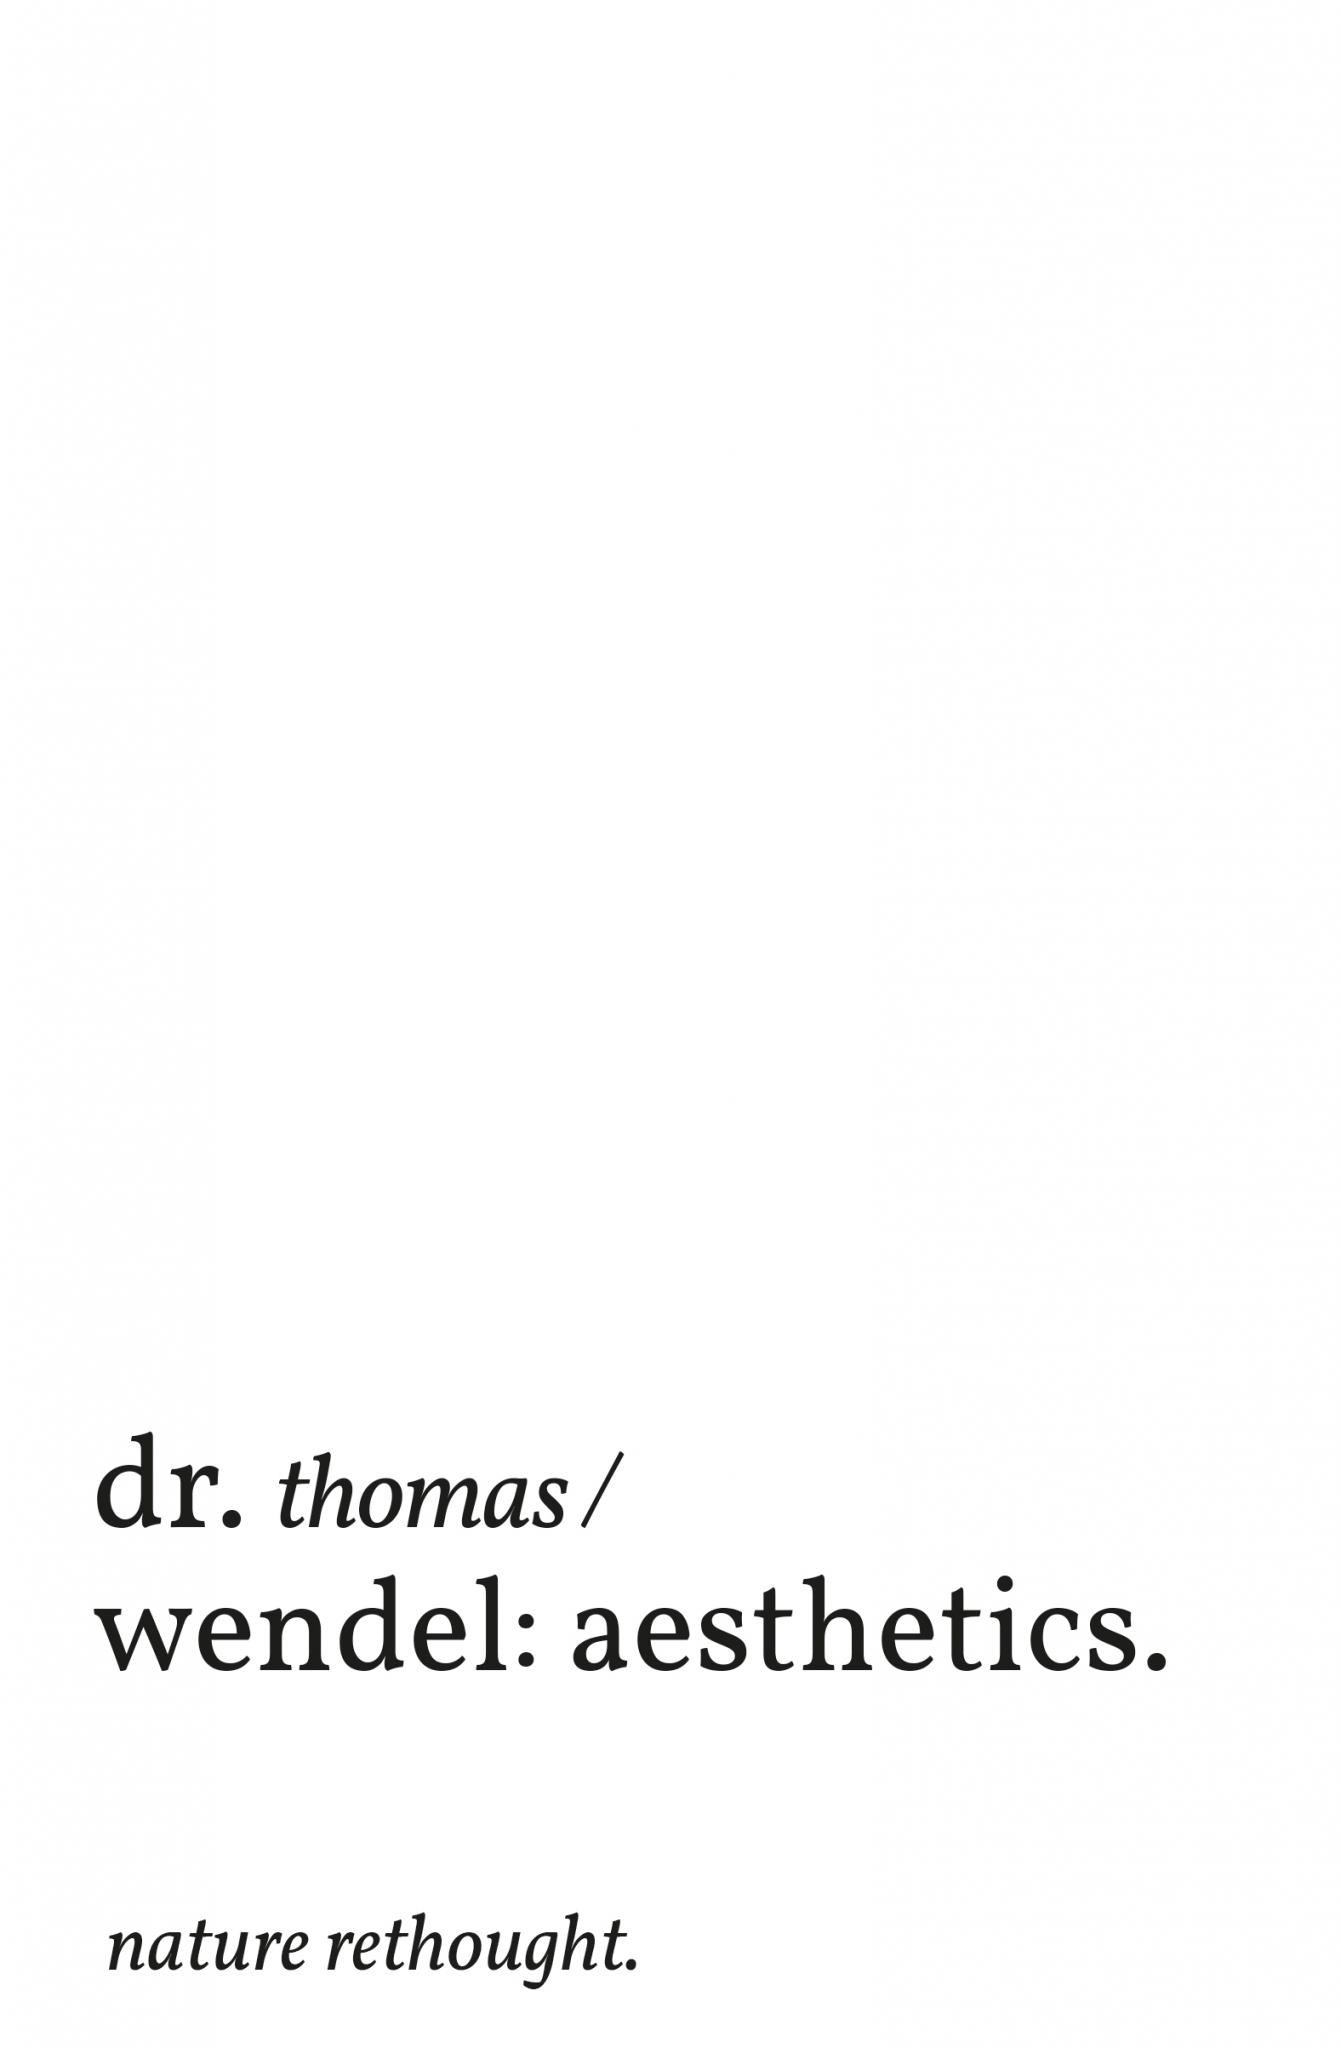 HSE24 Dr. Wendel Aesthetics